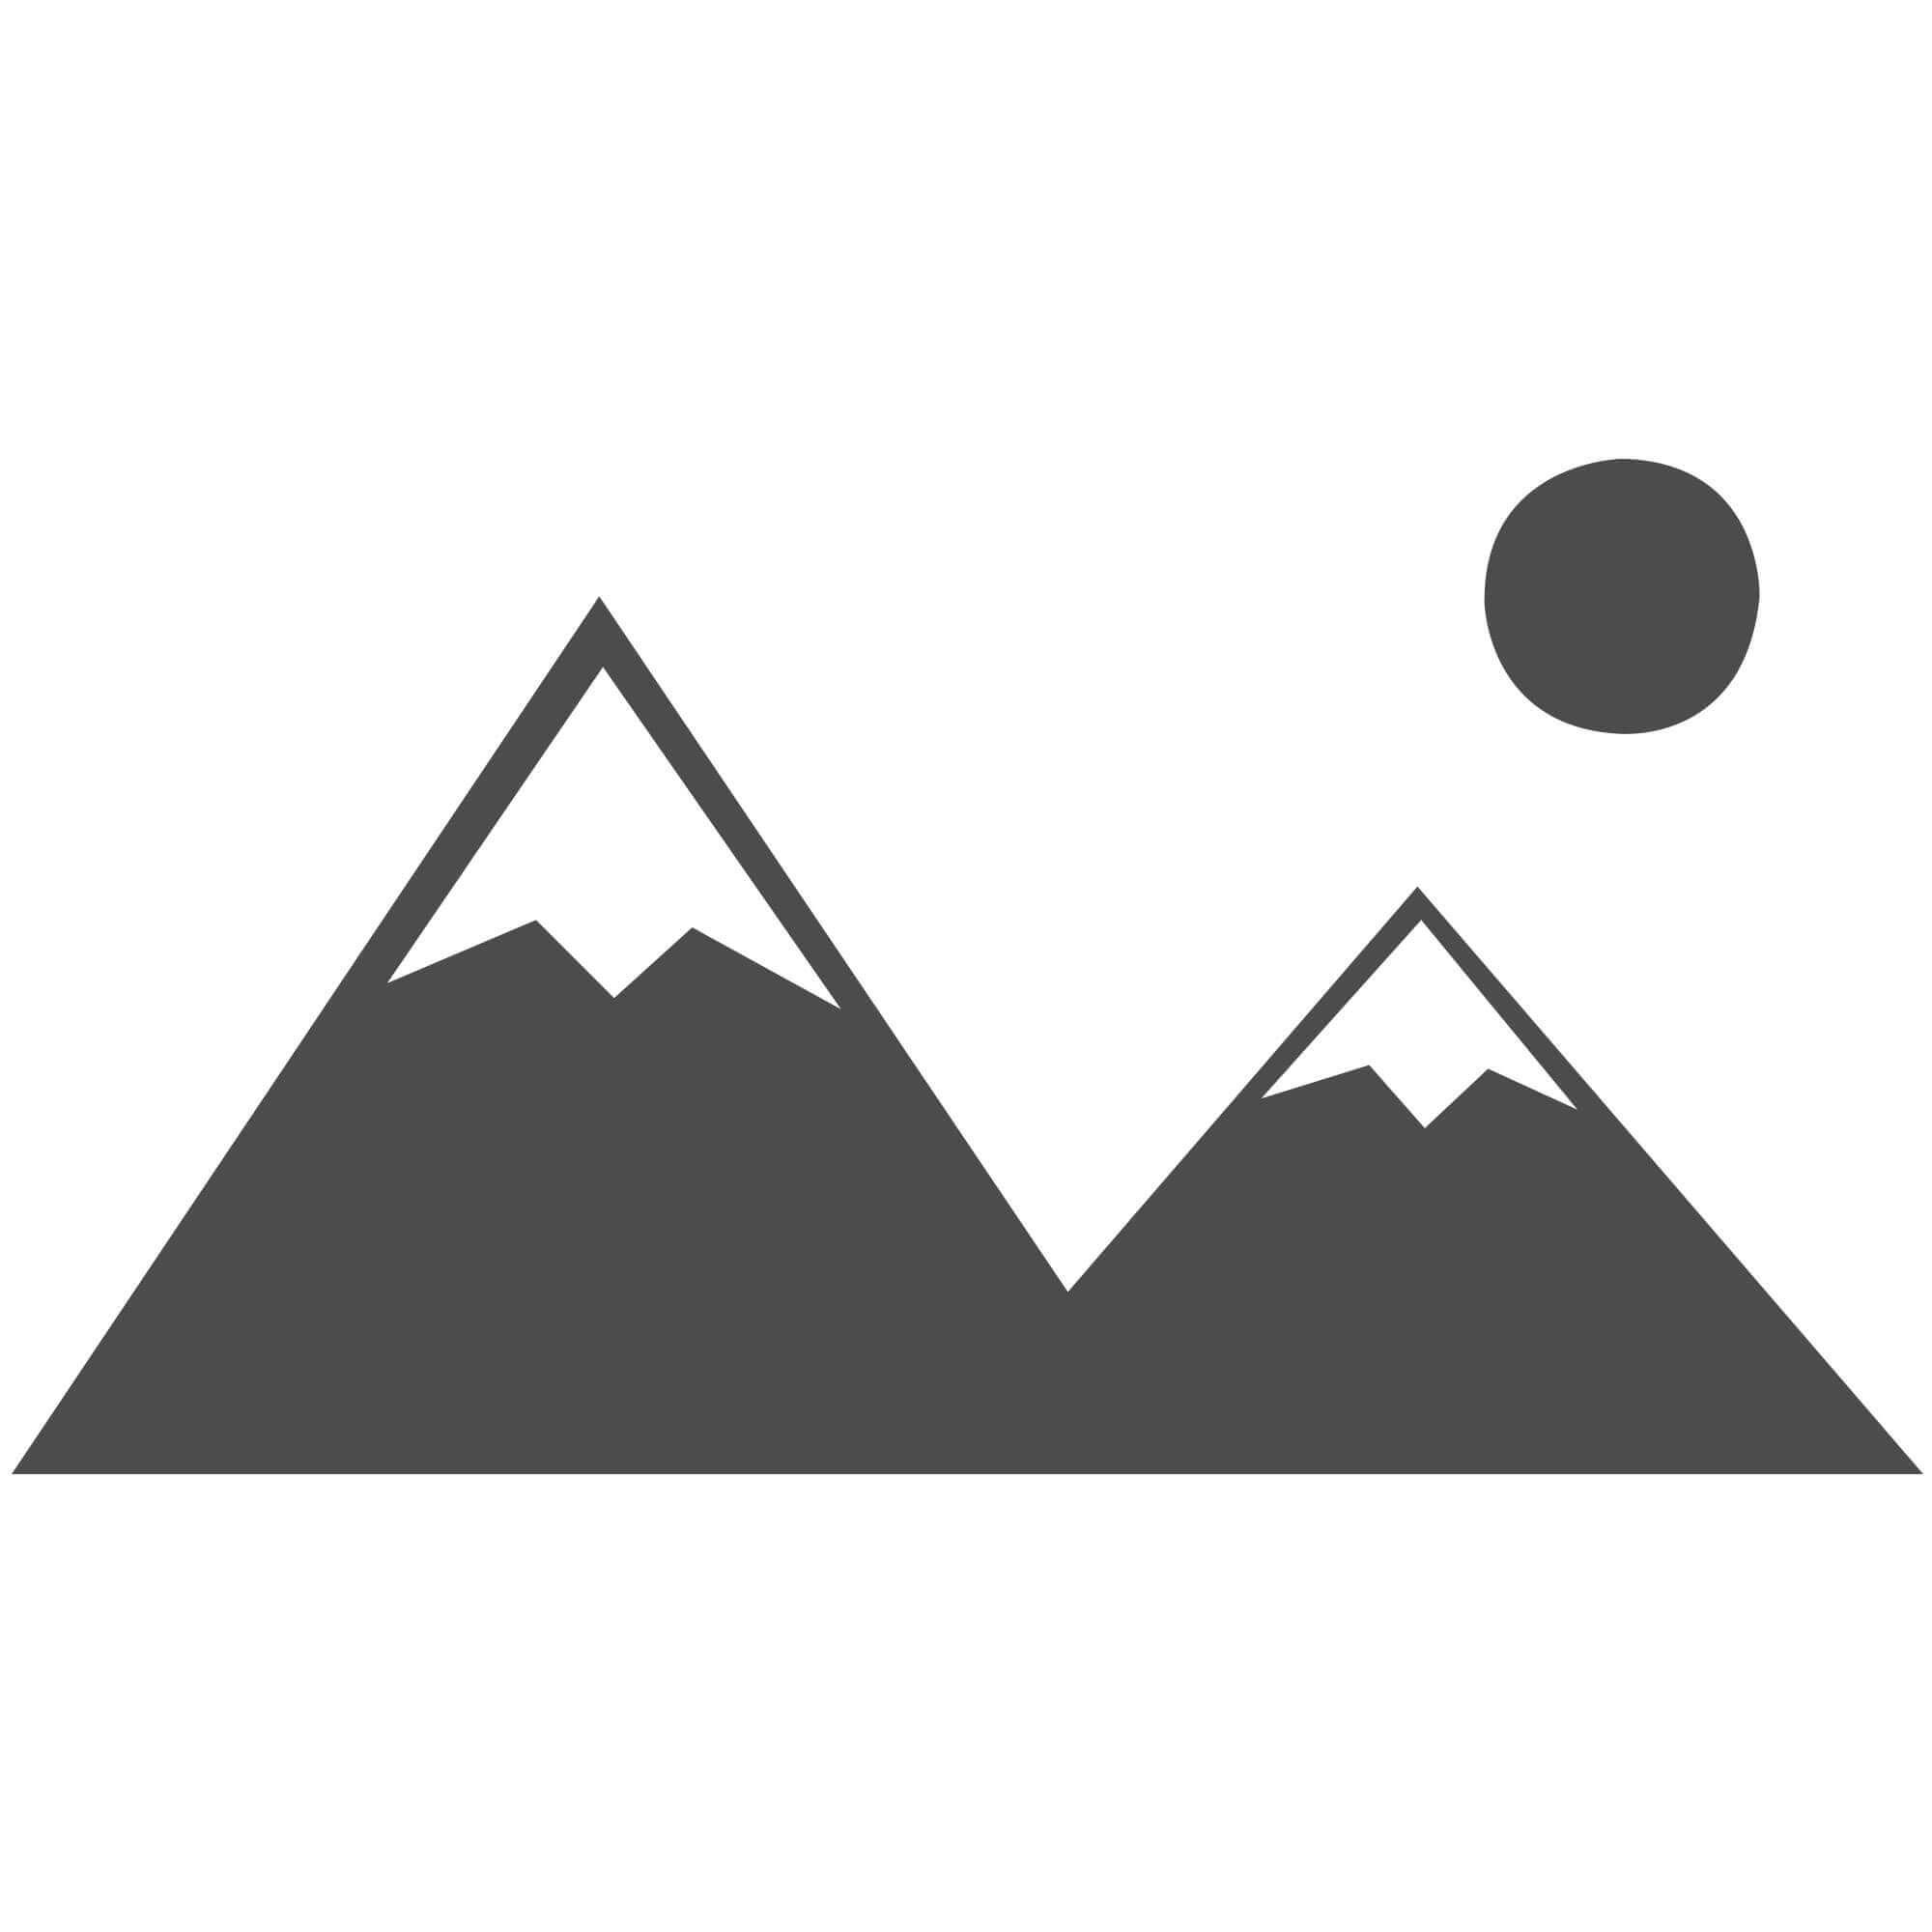 "Deco Rug - Graphite - Size 200 x 300 cm (6'7"" x 9'10"")"